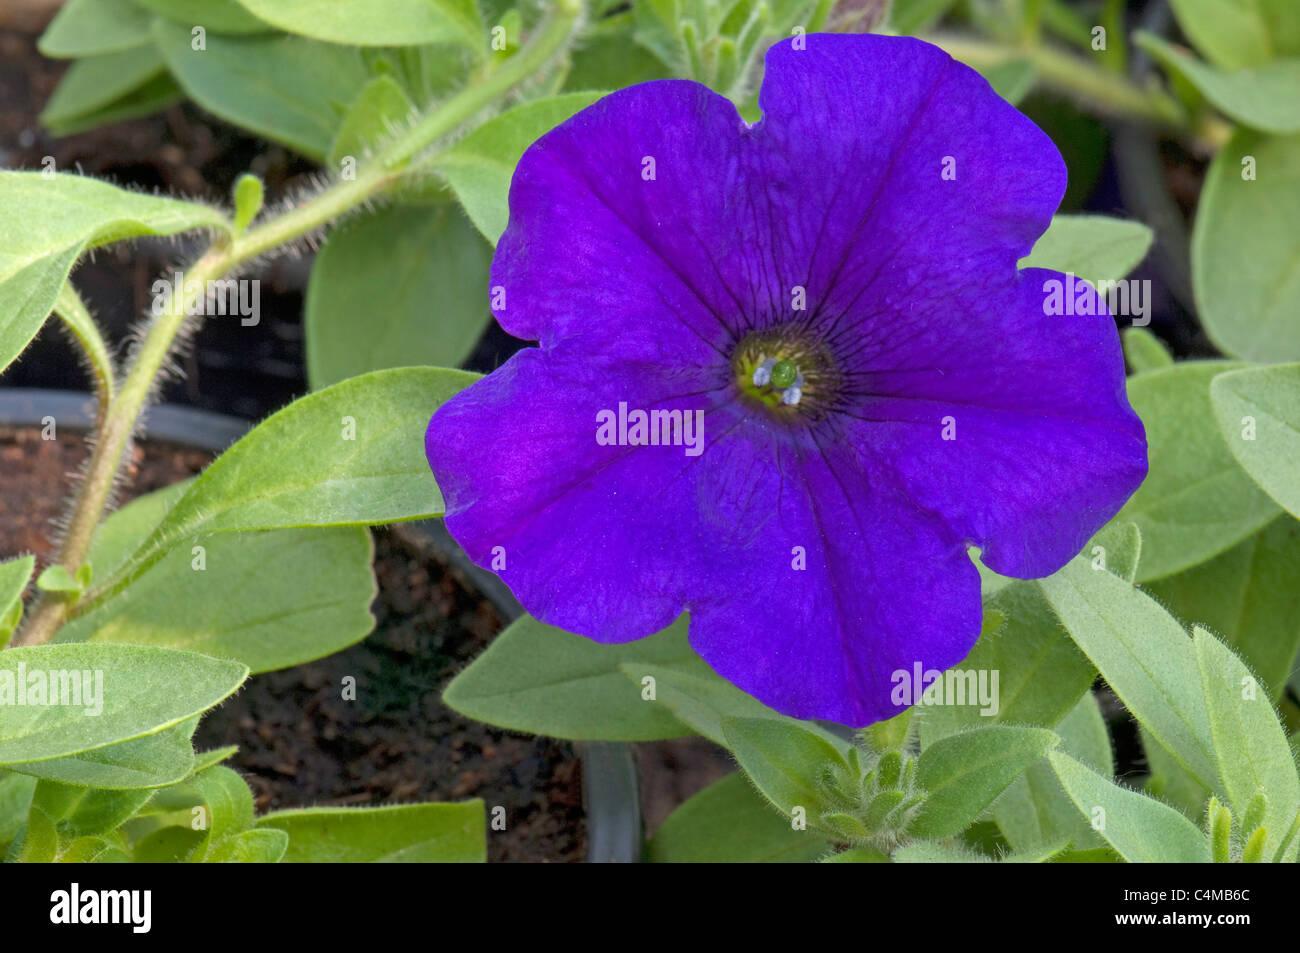 Garden Petunia (Petunia x hybrida), blue flower. - Stock Image